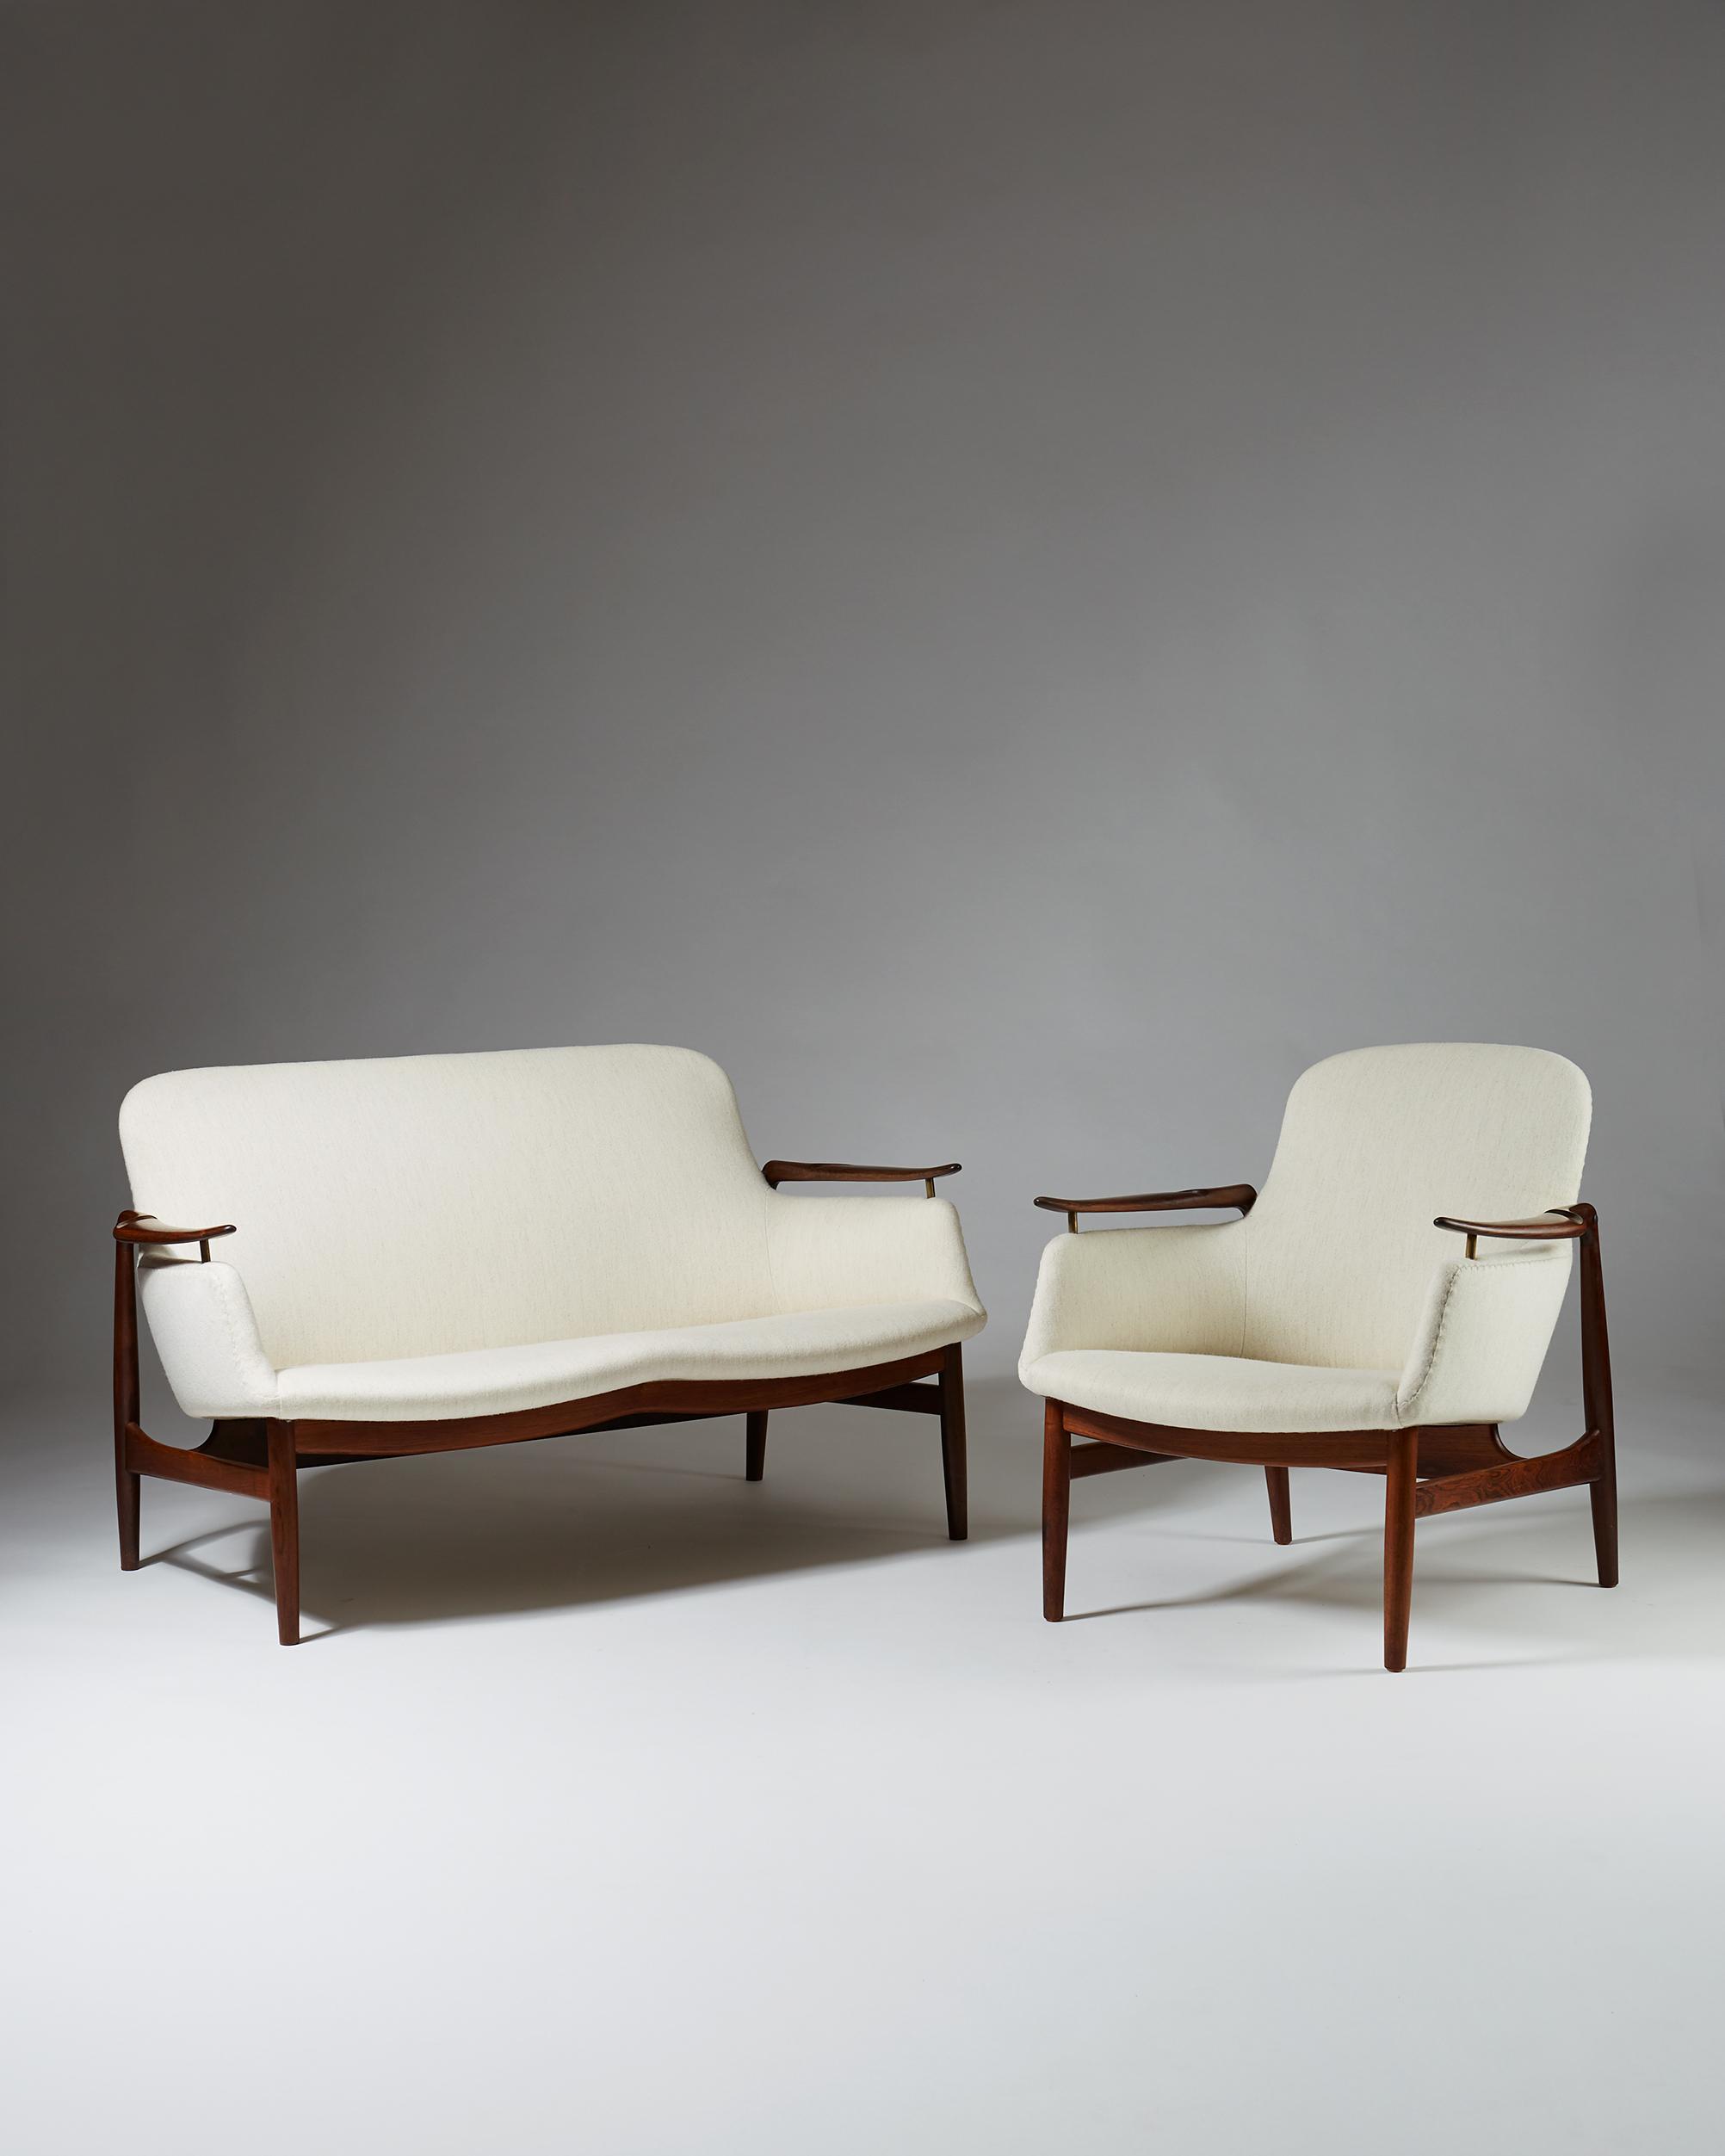 Finn Juhl  Sofa and armchair FJ 53 Denmark, 1953 Wool upholstery and Brazilian rosewood.  Sofa: 73 x 128 x 72 cm Seat: 36 cm  Armchair: 75,5 x 71 x 63 cm Seat: 34 cm